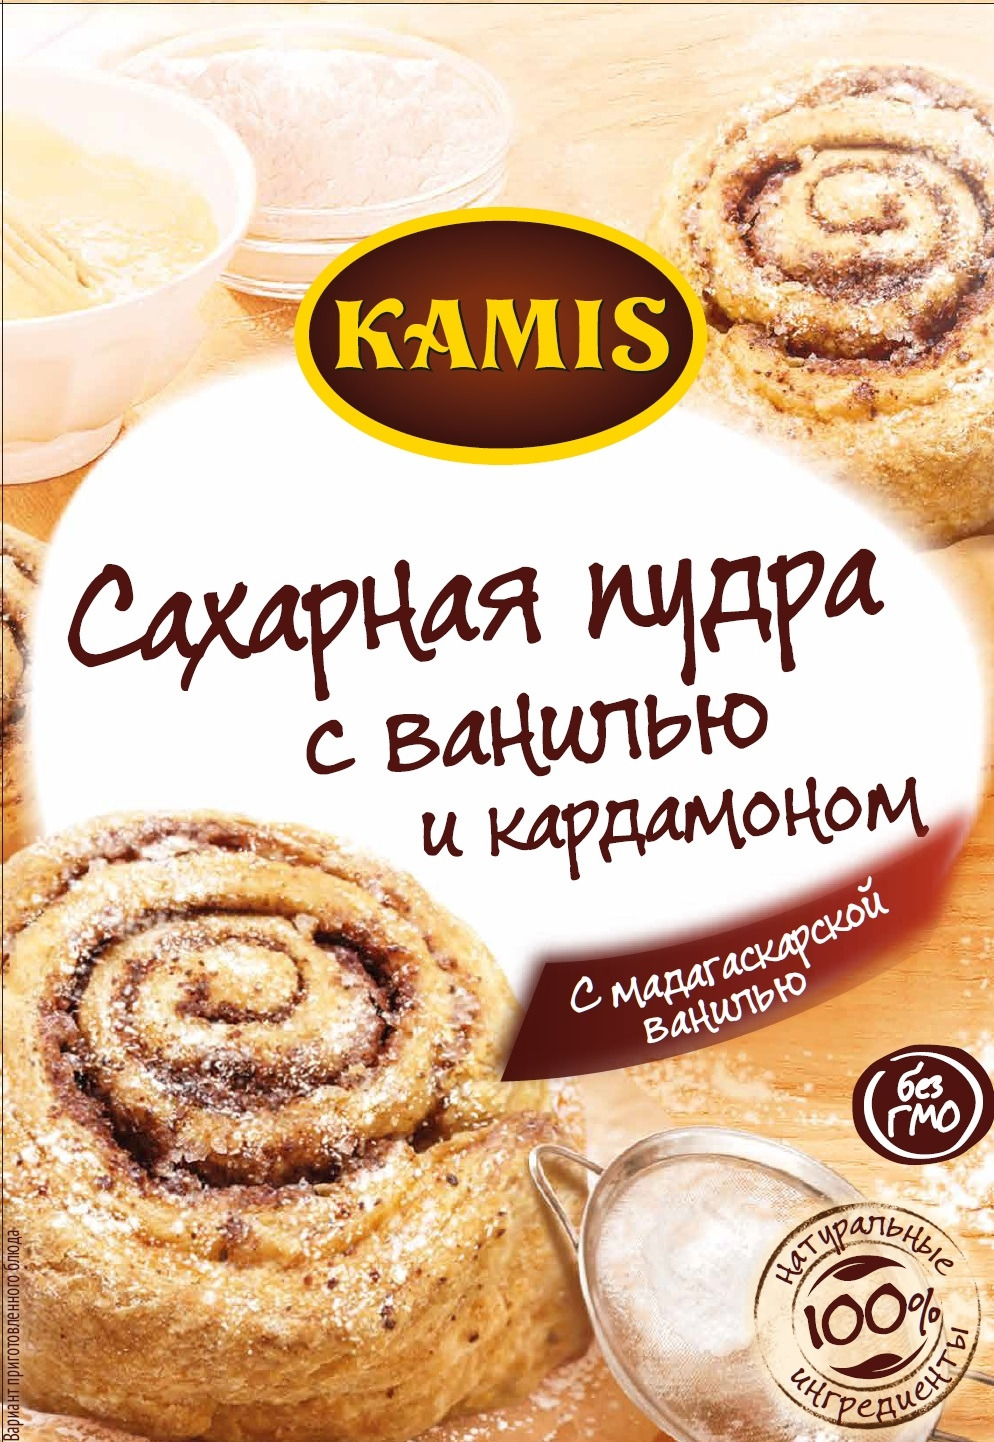 Kamis сахарная пудра с ванилью и кардамоном, 20 г вкусная помощь антистресс сахарная вата для мужчин набор 32 г